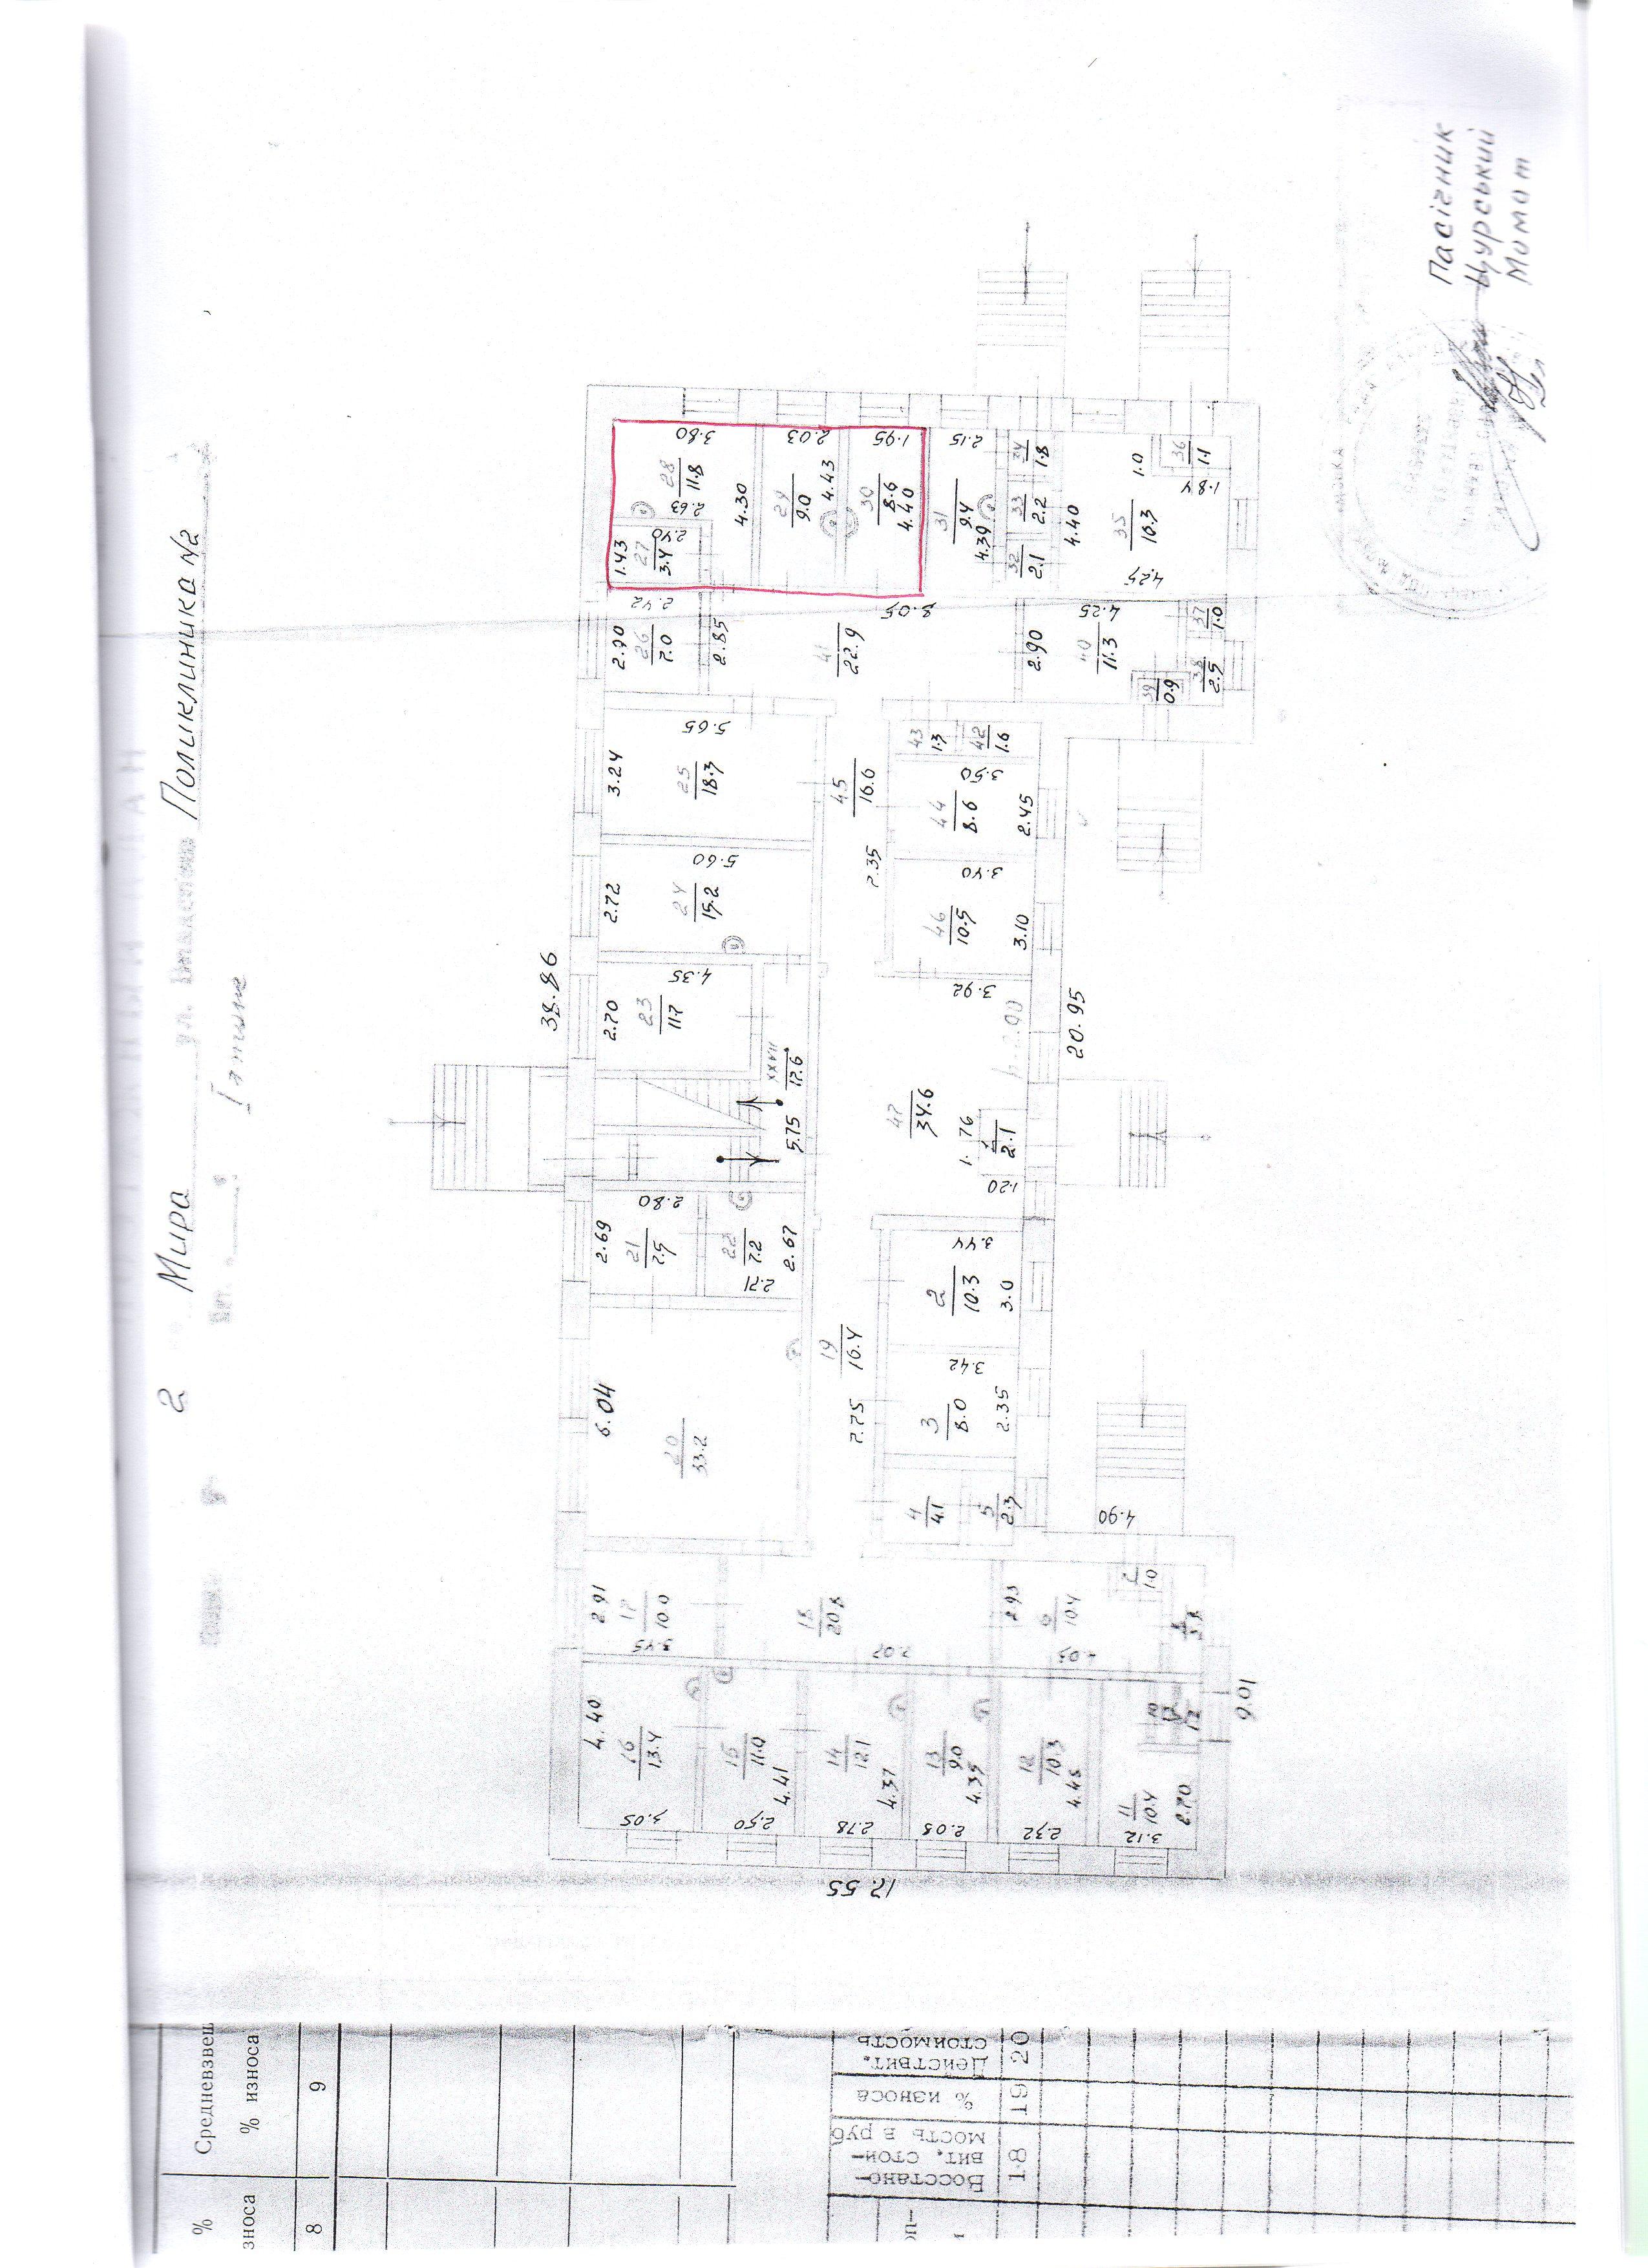 Нежитлове приміщення за адресою: вул. Миру, 2 м. Кам'янець-Подільський, Хмельницька обл.